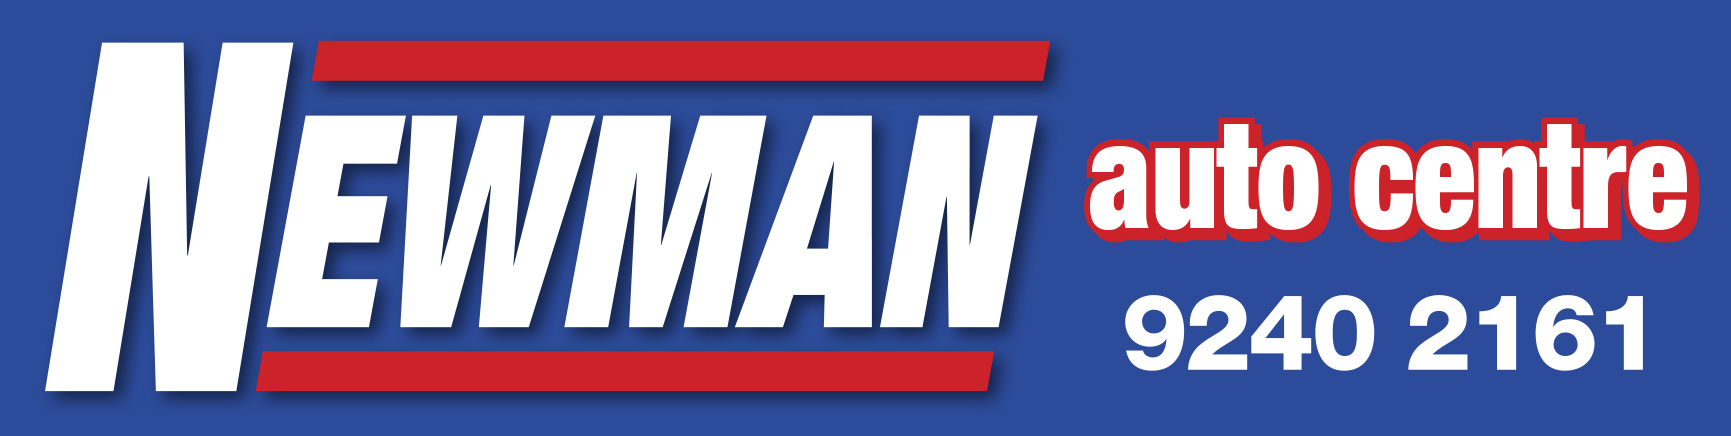 Newman Auto Centre - Auto Electrician, Airconditioning